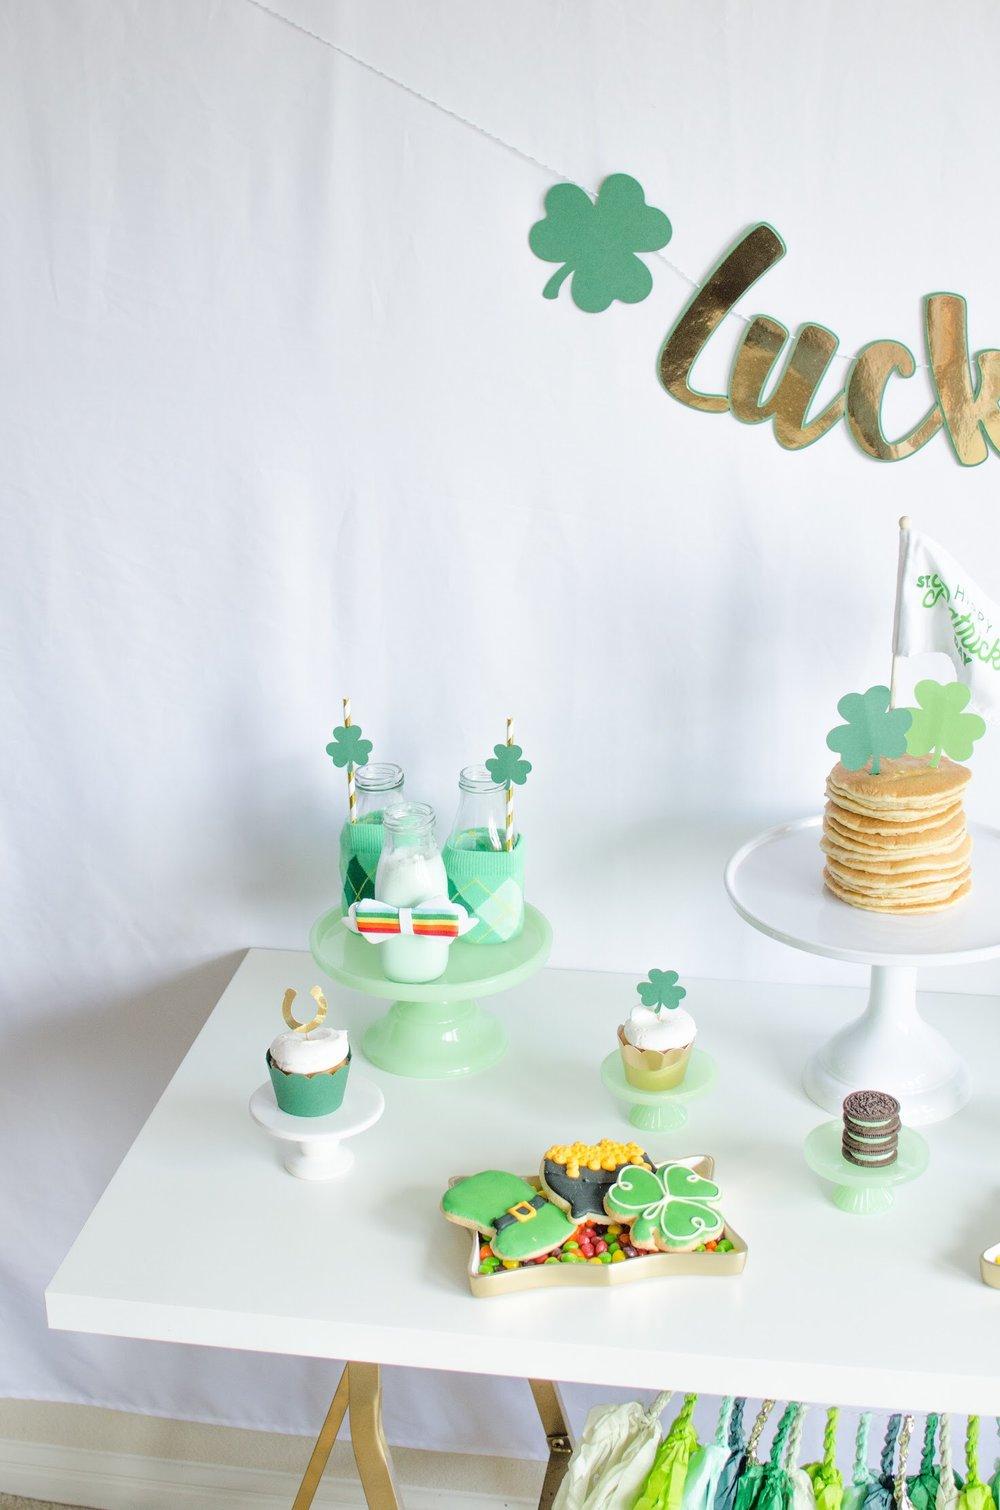 Perfect St. Patrick's Day breakfast idea from Mint Event Design www.minteventdesign.com #partyideas #partydecorations #saintpatricksday #stpatricksday #tablescape #desserttable